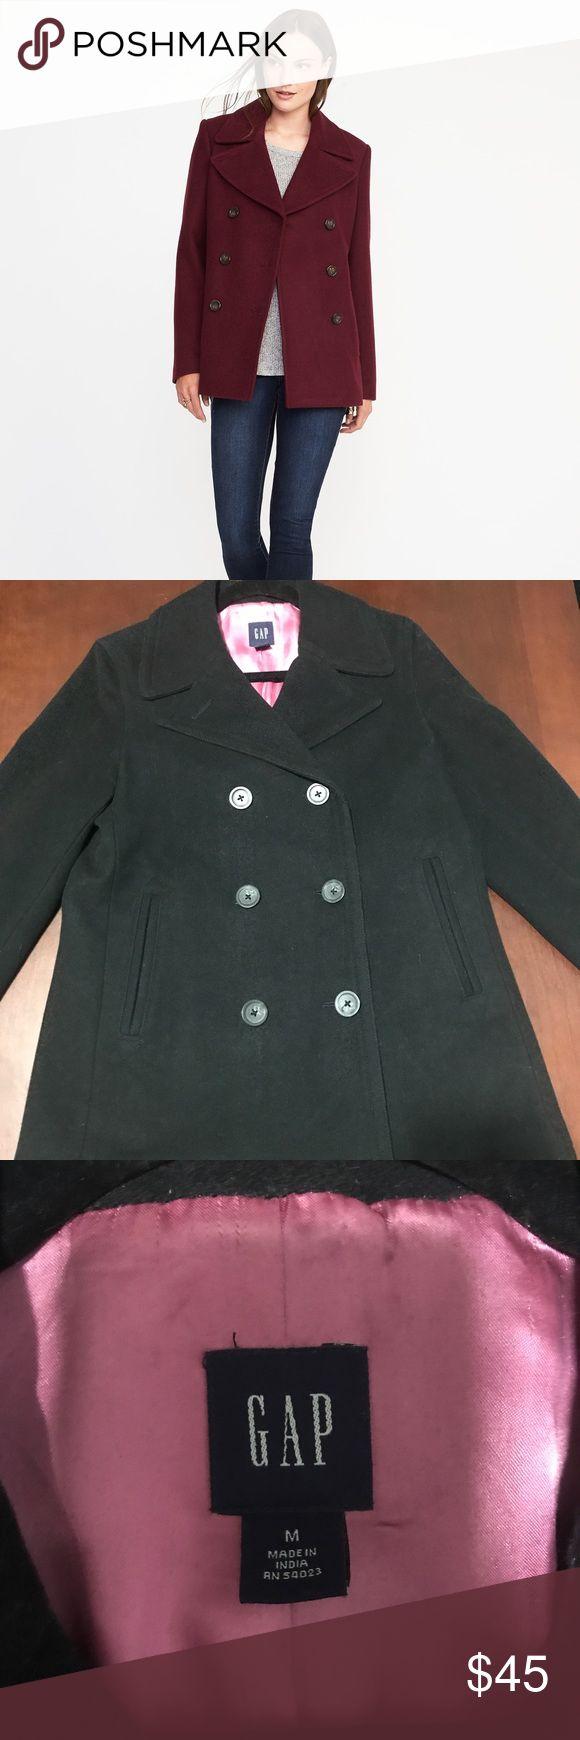 Gap black pea coat It has been used but still in good condition GAP Jackets & Coats Pea Coats